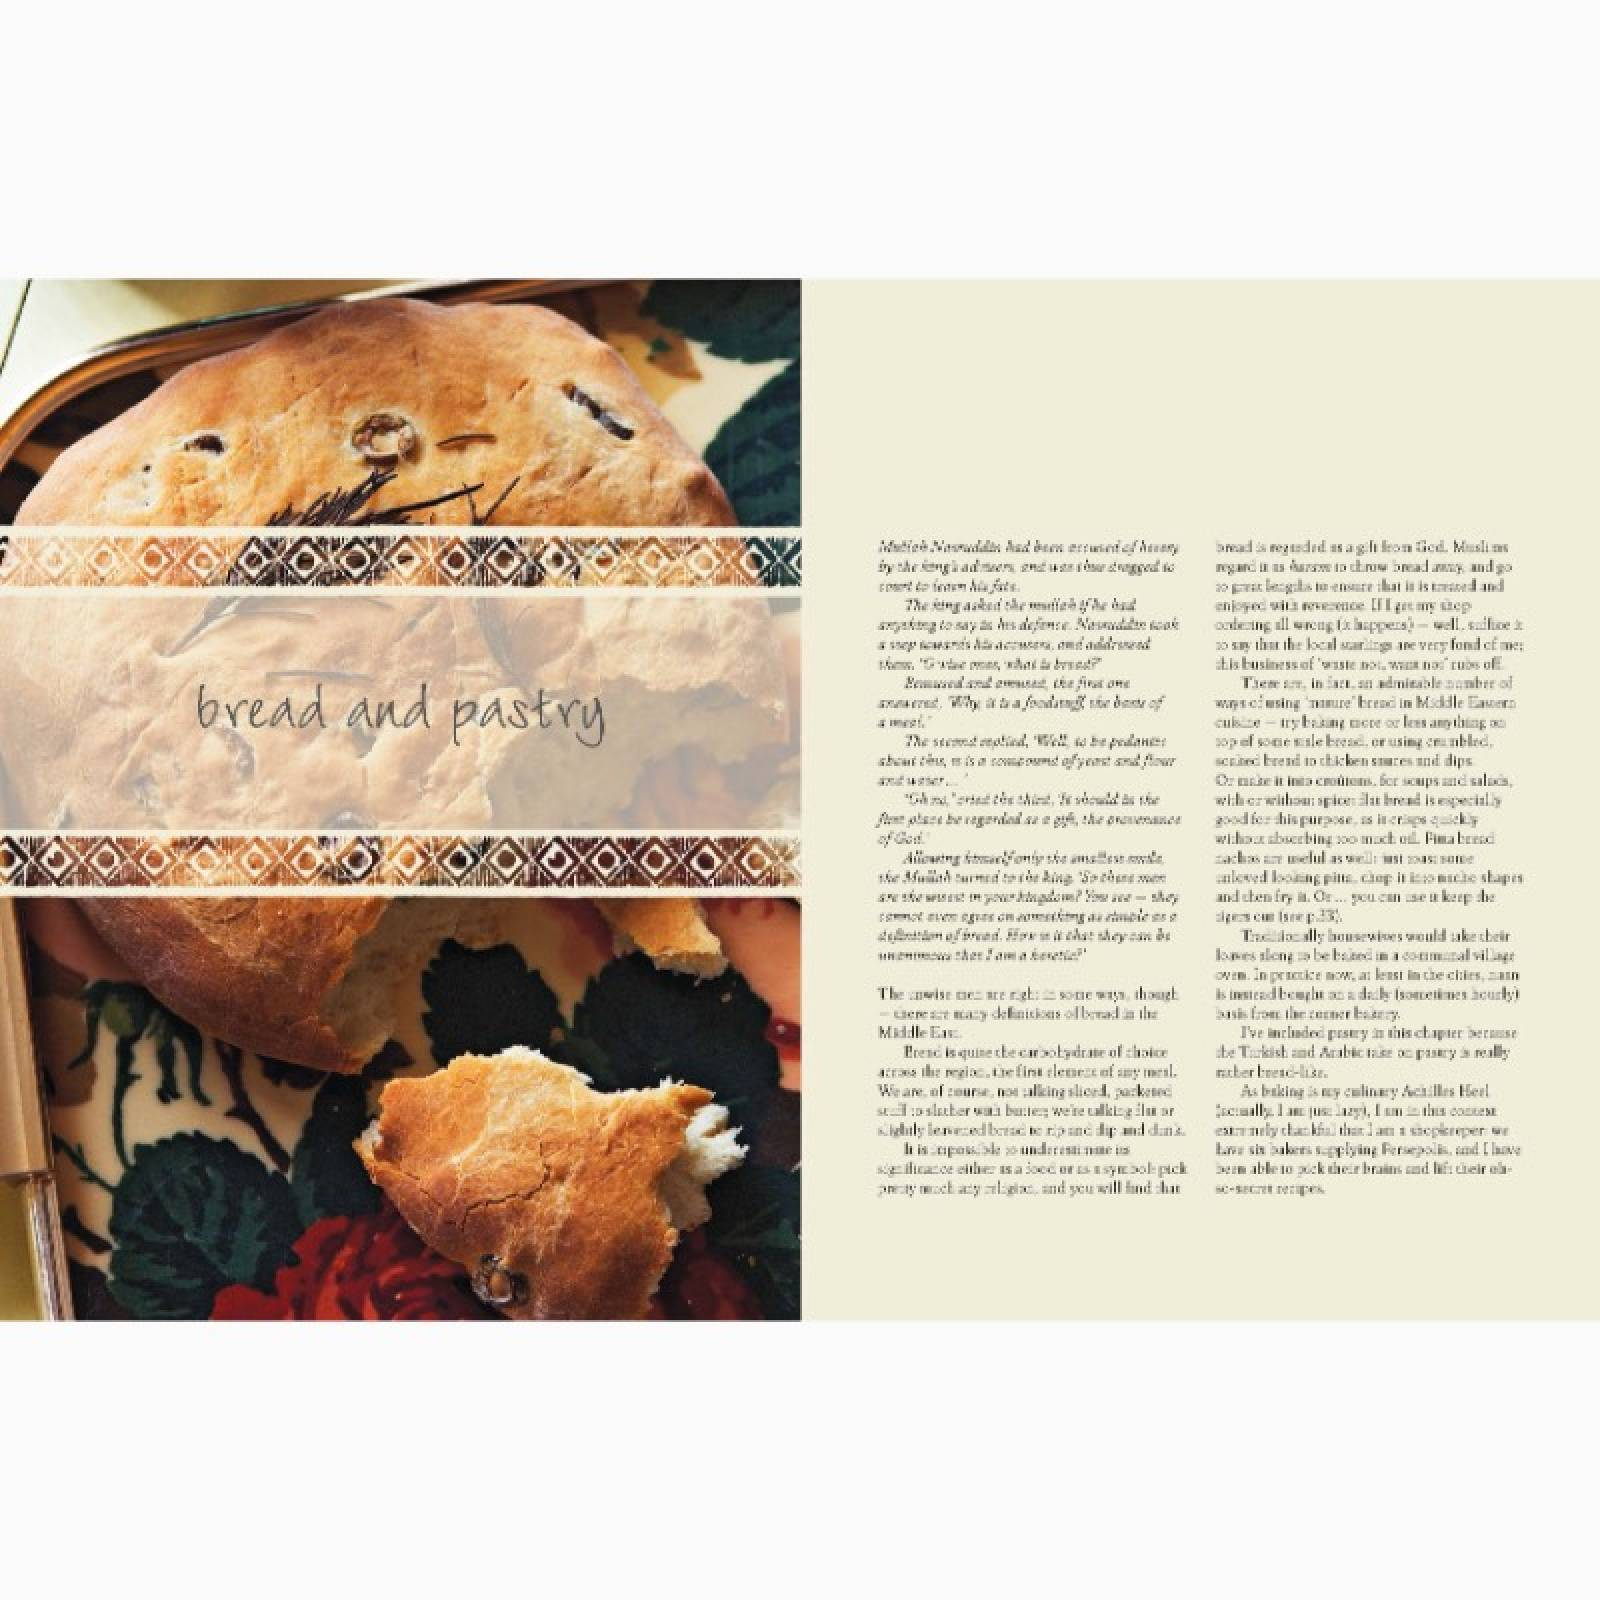 Veggiestan (10th Anniversary edition) - Hardback Book thumbnails